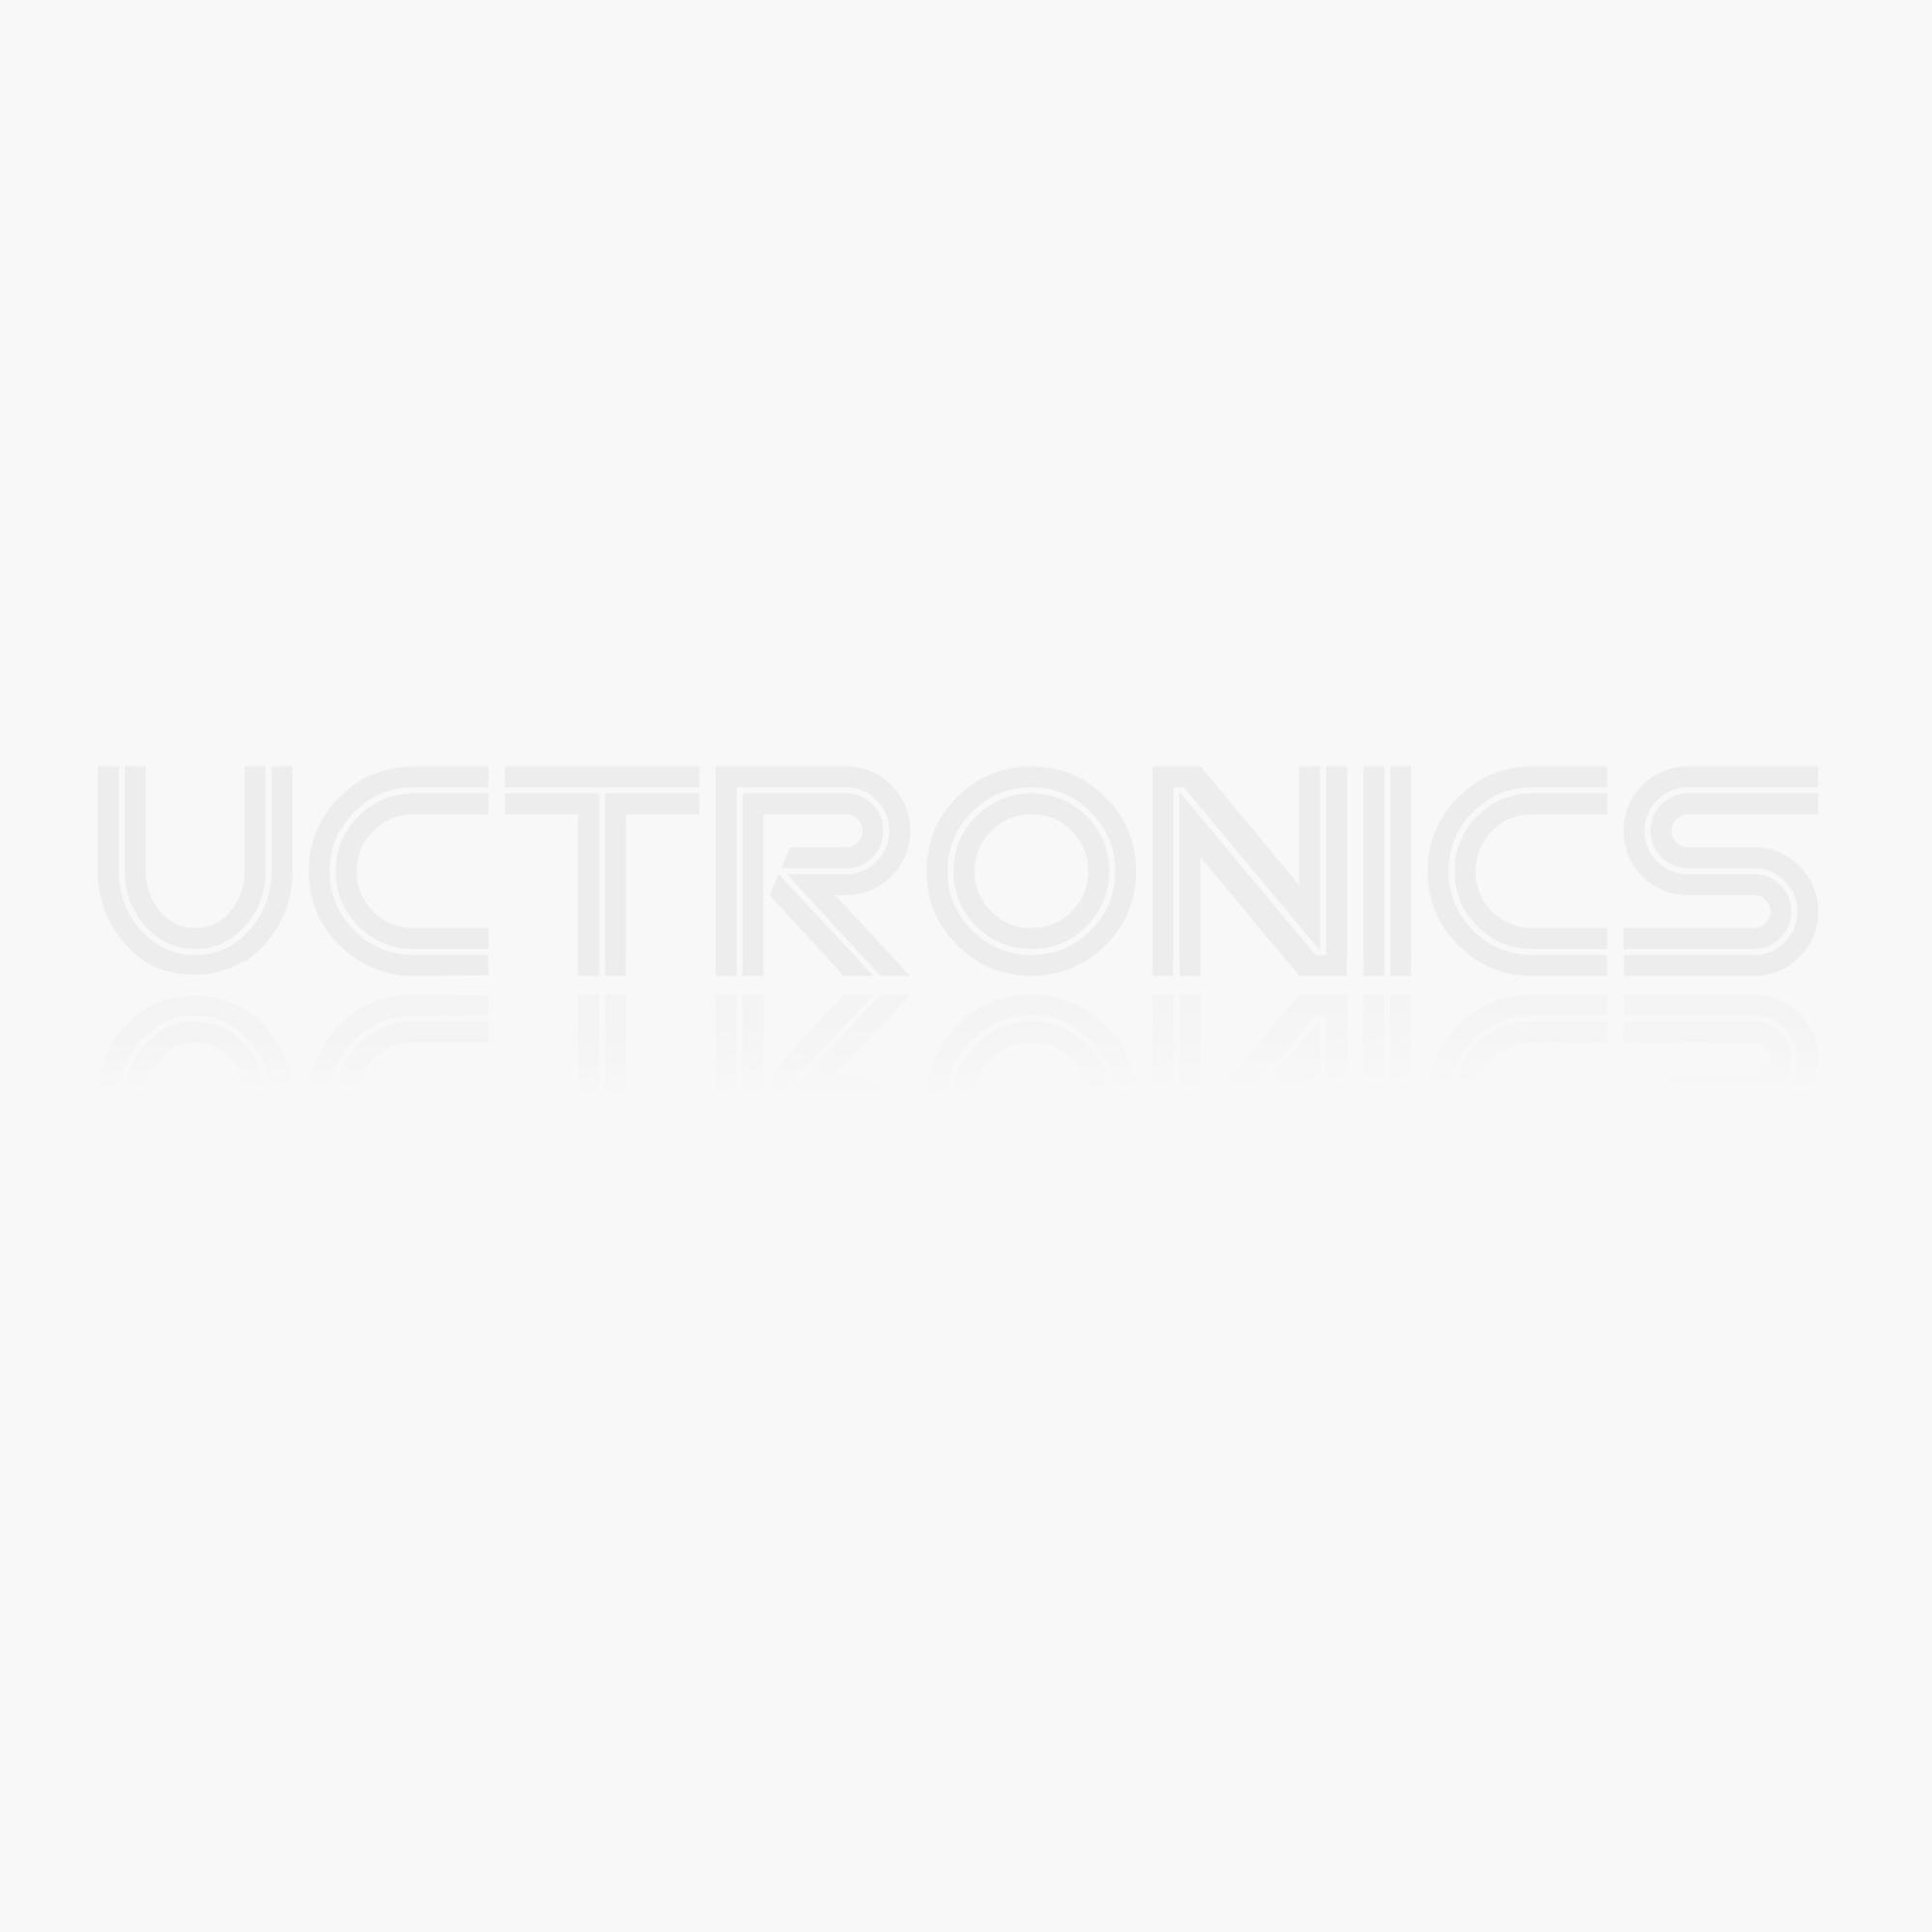 MP1495 3A 16V to 1.25V 1.5V 2.5V 3.3V 5V Adjustable Power Step Down Converter